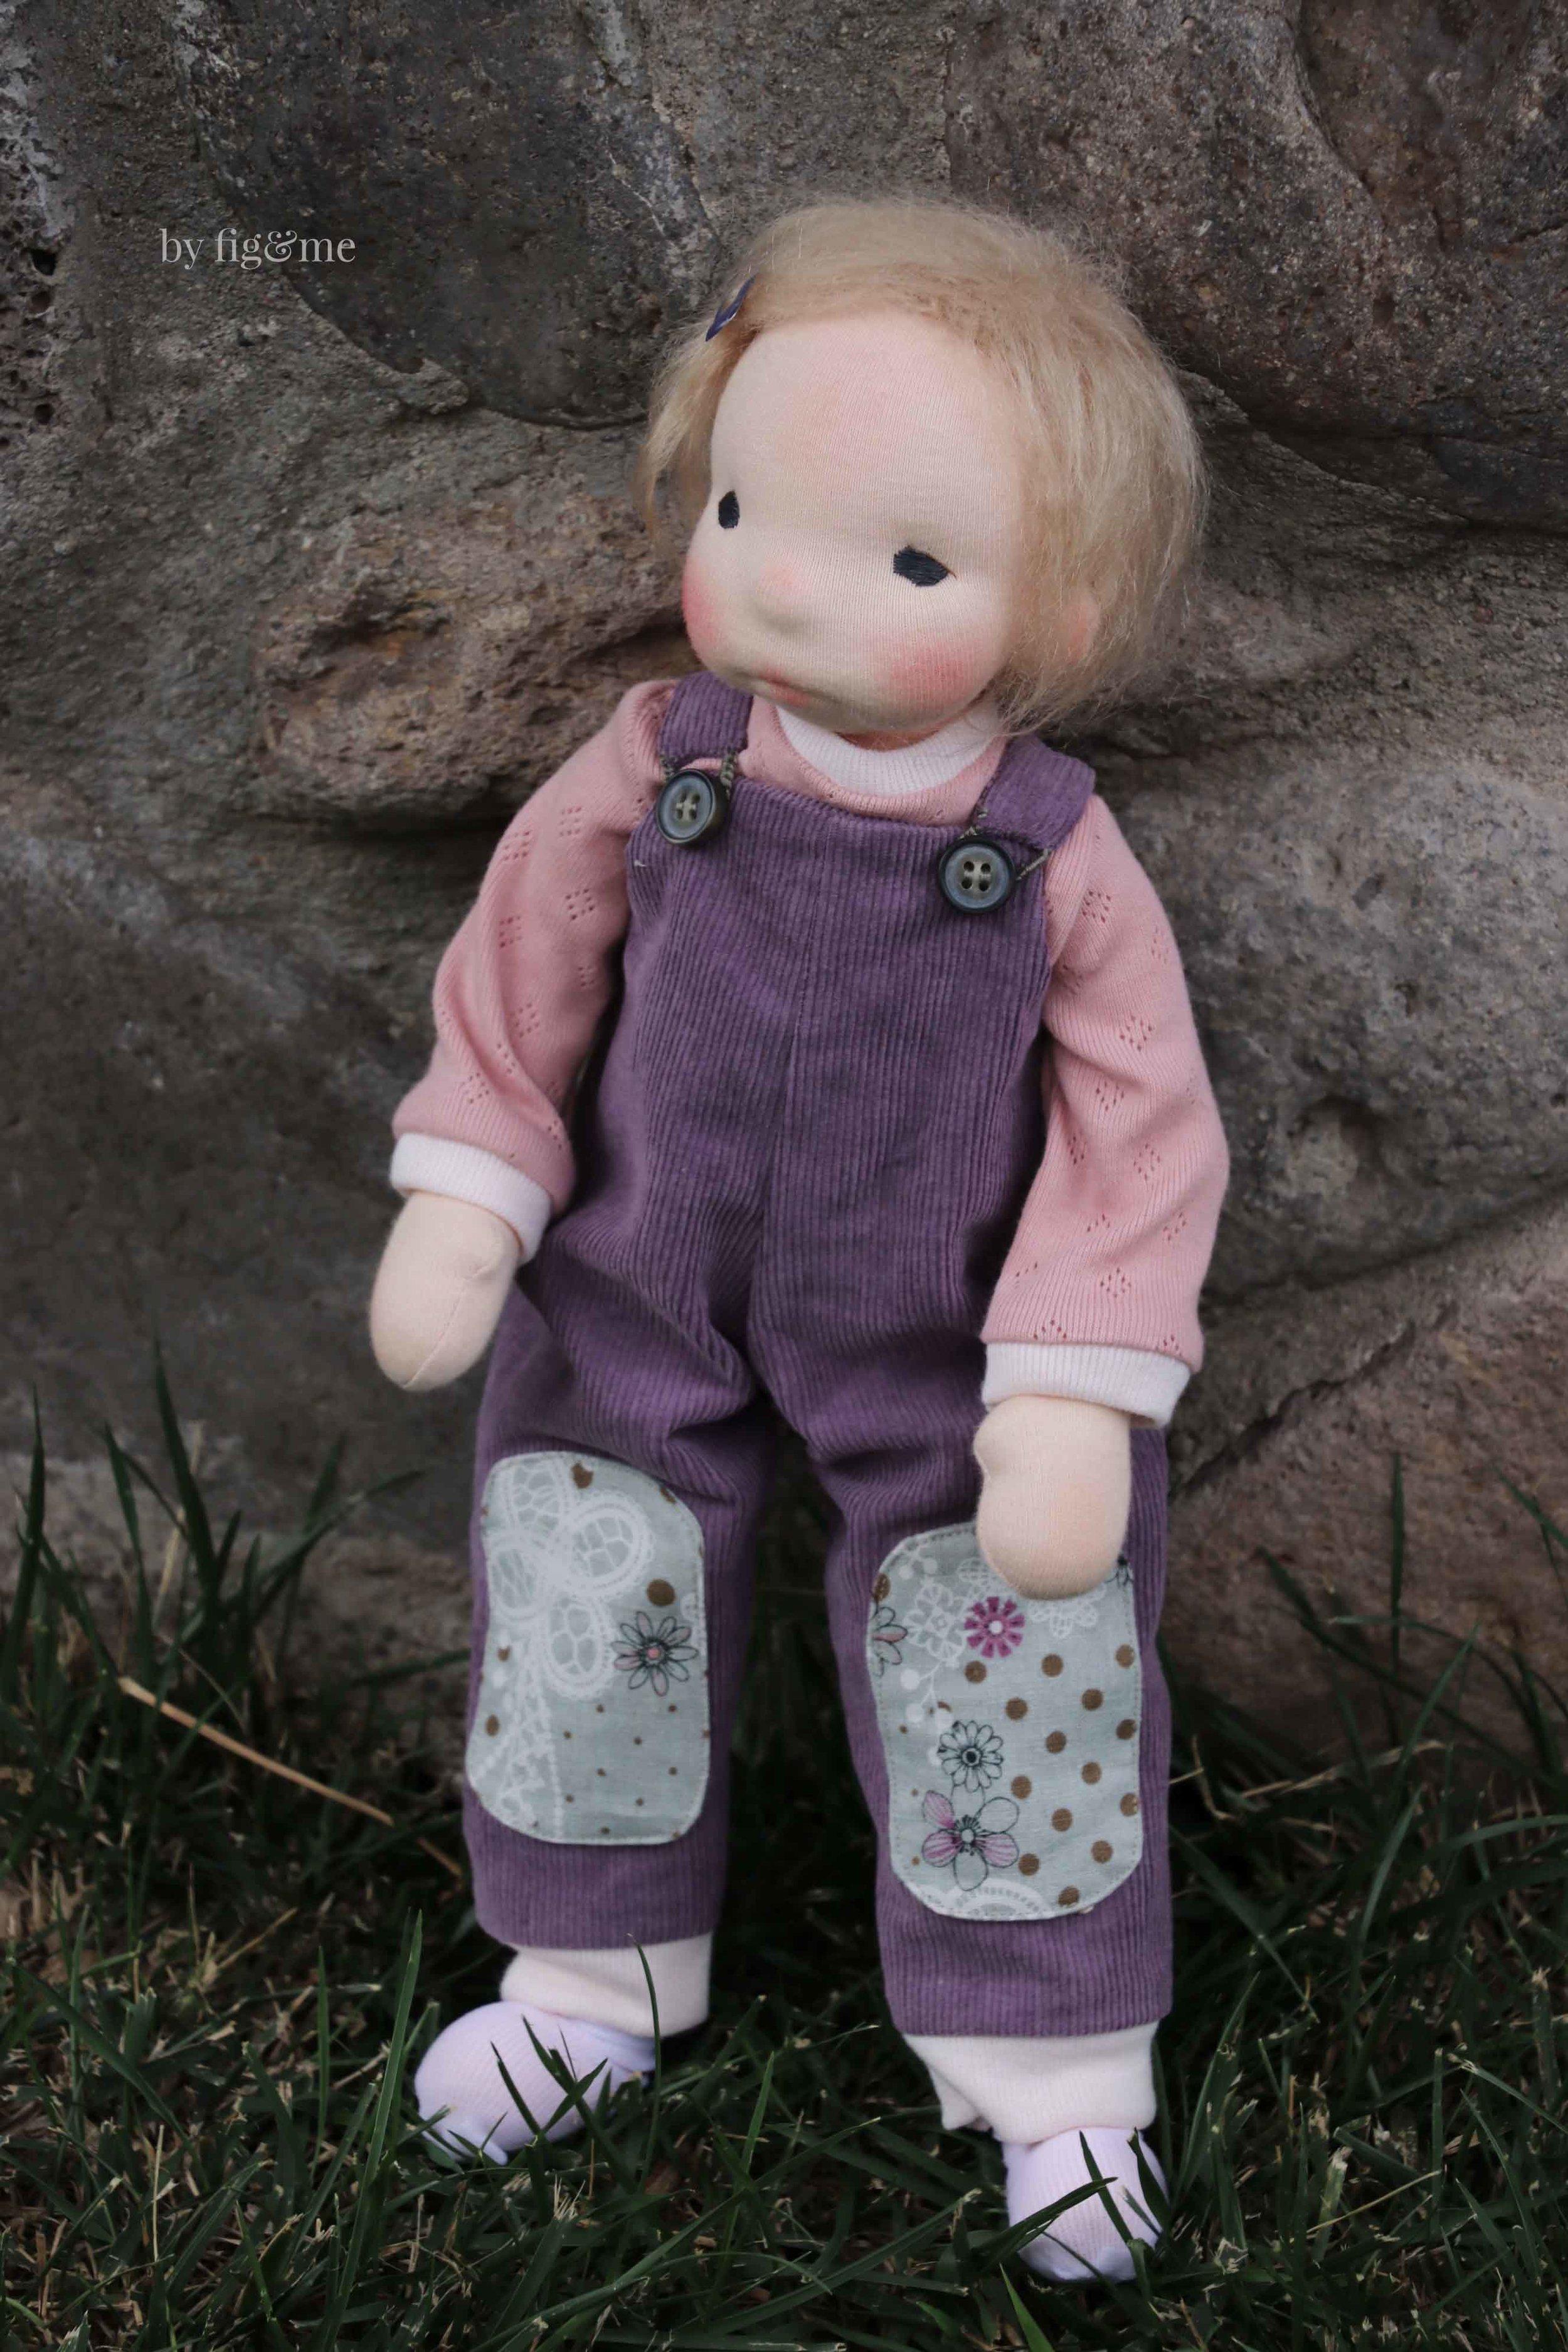 waldorf-doll-clothing-pattern-little-penny.jpg